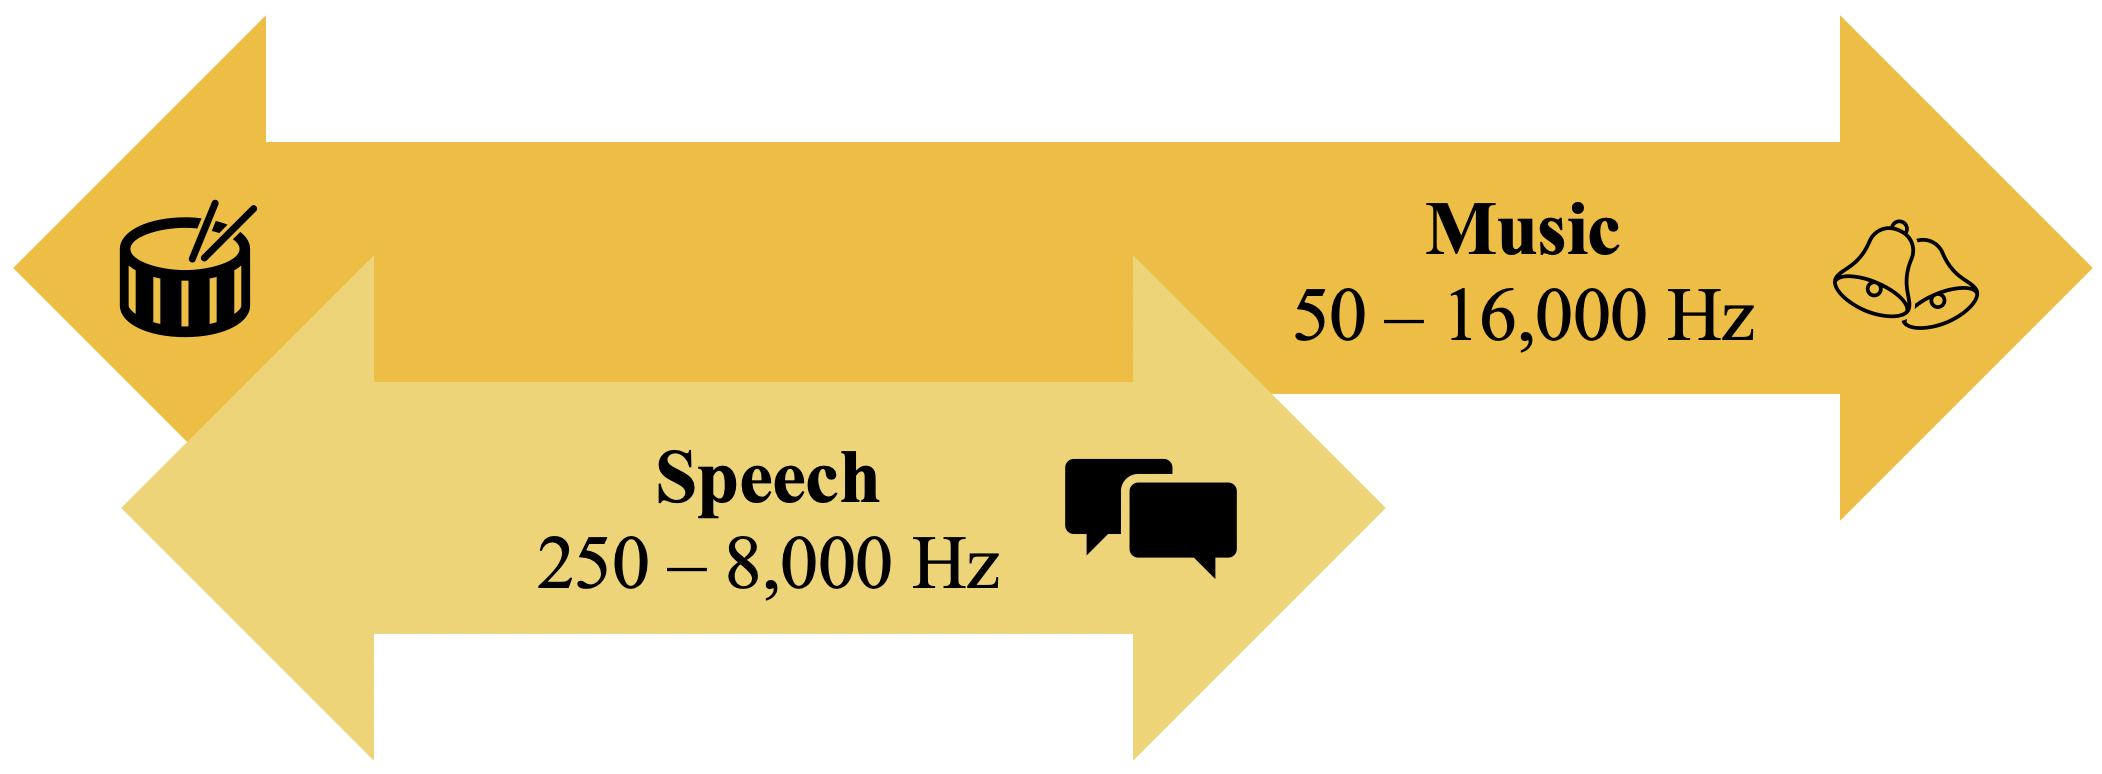 Speech and Music graphic